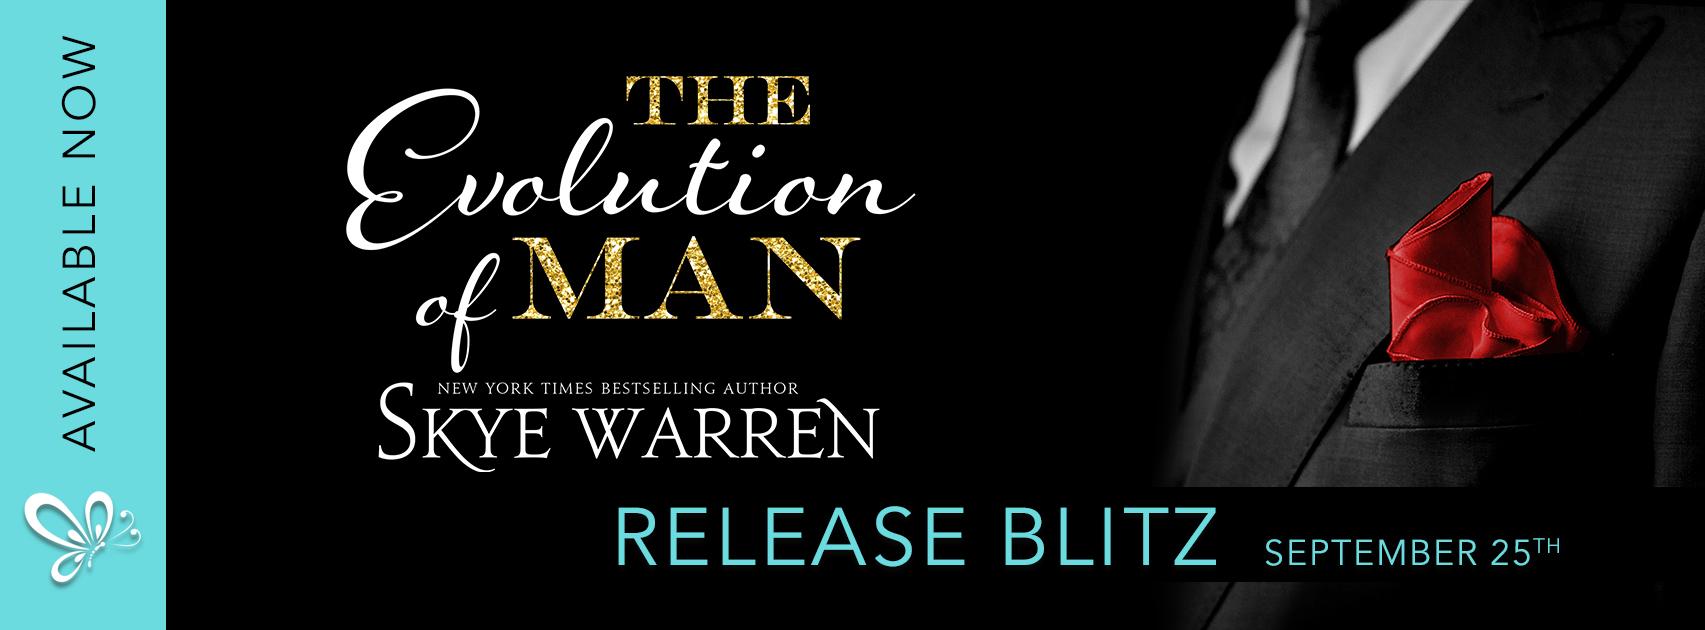 THE EVOLUTION OF MAN by Skye Warren @skye_warren @jennw23 #NewRelease #NowAvailable #Review #theUnratedBookshelf